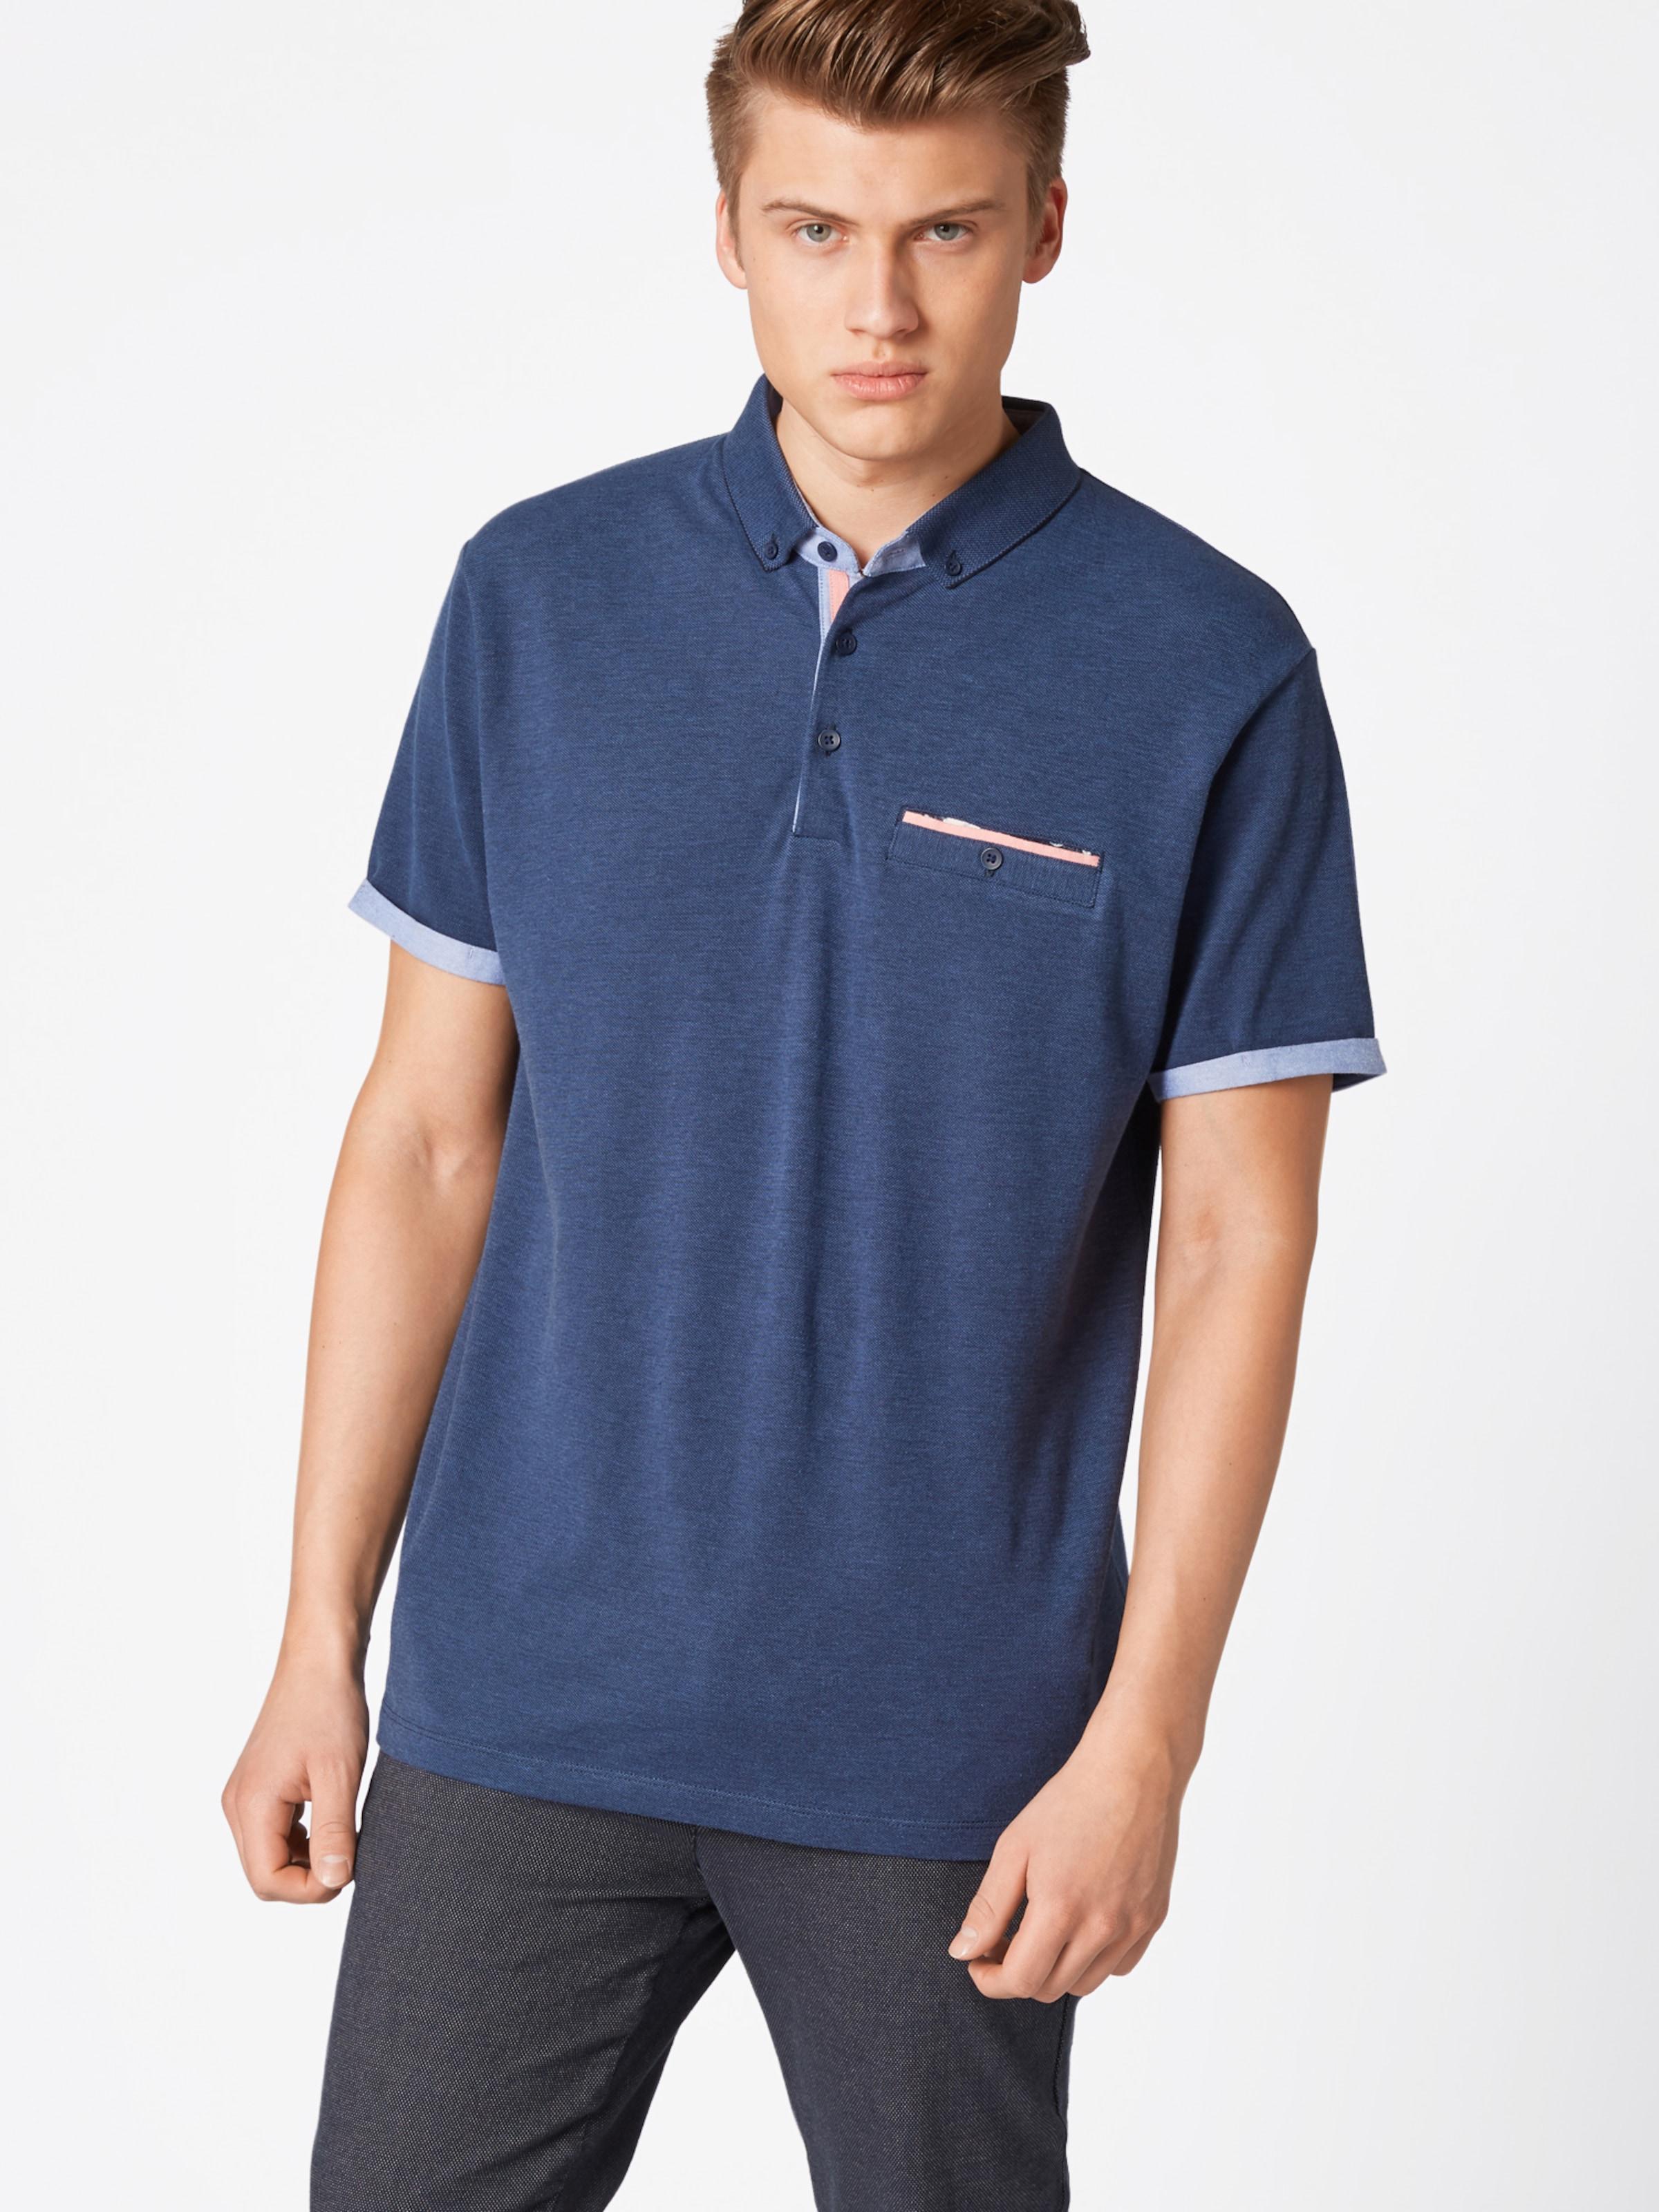 'ocs Bleu Marine Esprit shirt Oxpi Ss' T Po En wiukOTXZP